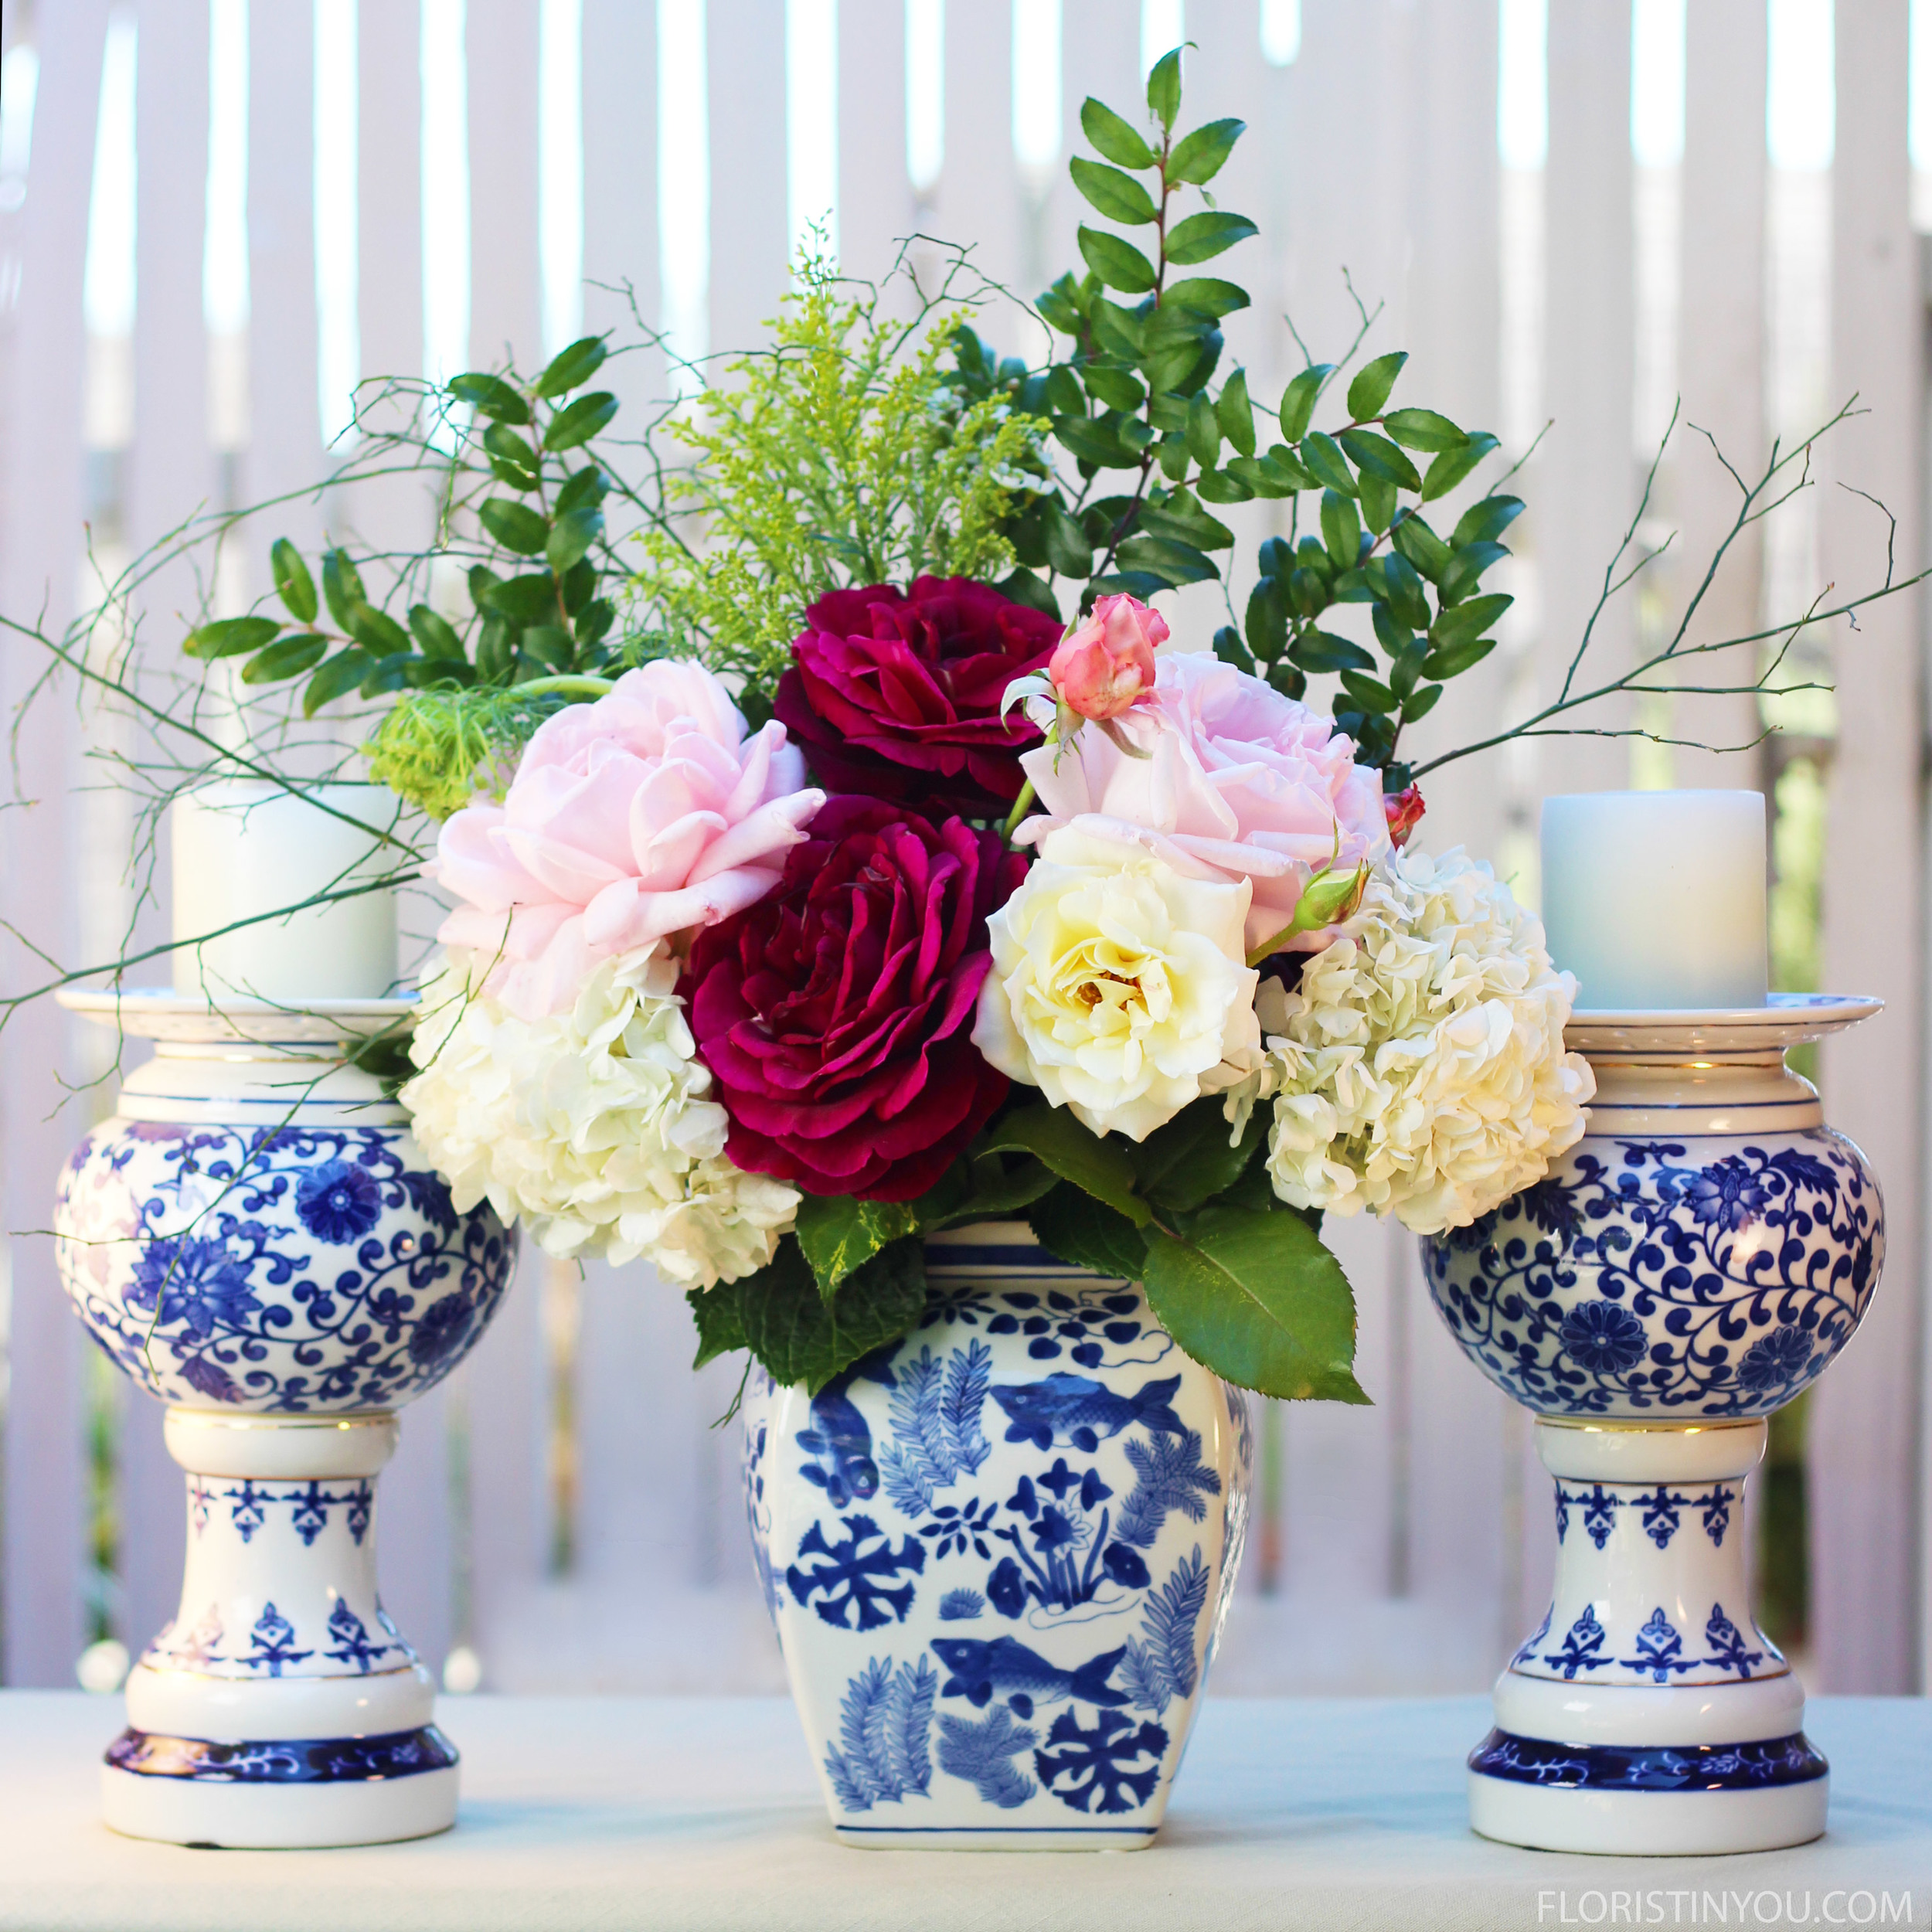 "Ginger Jar Roses                     Normal   0           false   false   false     EN-US   JA   X-NONE                                                                                                                                                                                                                                                                                                                                                                              /* Style Definitions */ table.MsoNormalTable {mso-style-name:""Table Normal""; mso-tstyle-rowband-size:0; mso-tstyle-colband-size:0; mso-style-noshow:yes; mso-style-priority:99; mso-style-parent:""""; mso-padding-alt:0in 5.4pt 0in 5.4pt; mso-para-margin:0in; mso-para-margin-bottom:.0001pt; mso-pagination:widow-orphan; font-size:12.0pt; font-family:Cambria; mso-ascii-font-family:Cambria; mso-ascii-theme-font:minor-latin; mso-hansi-font-family:Cambria; mso-hansi-theme-font:minor-latin;}"